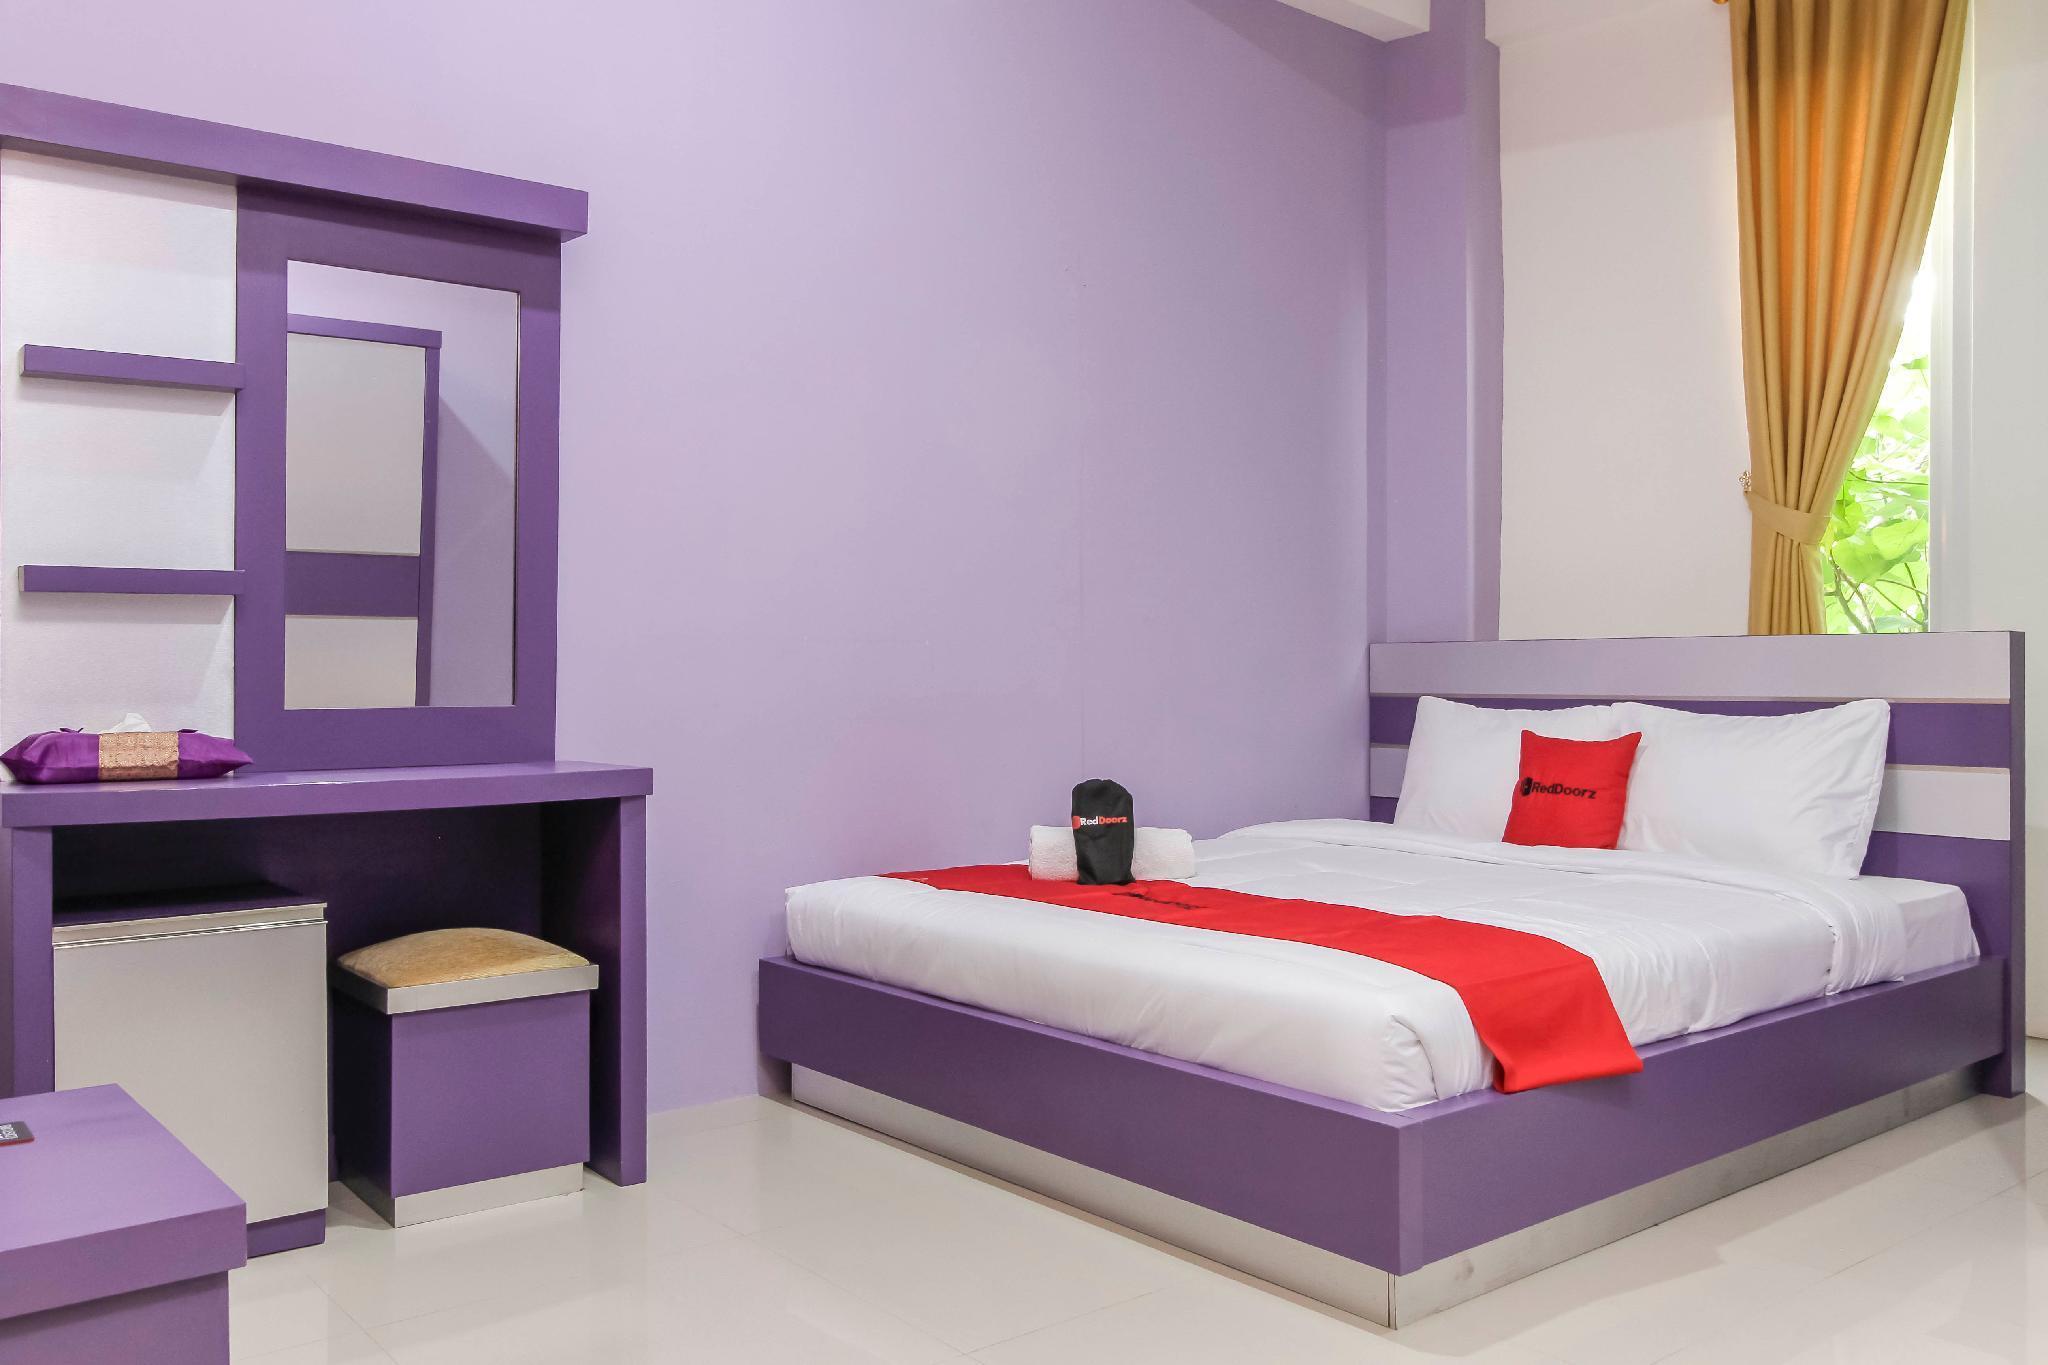 10 best bekasi hotels hd photos reviews of hotels in bekasi rh agoda com